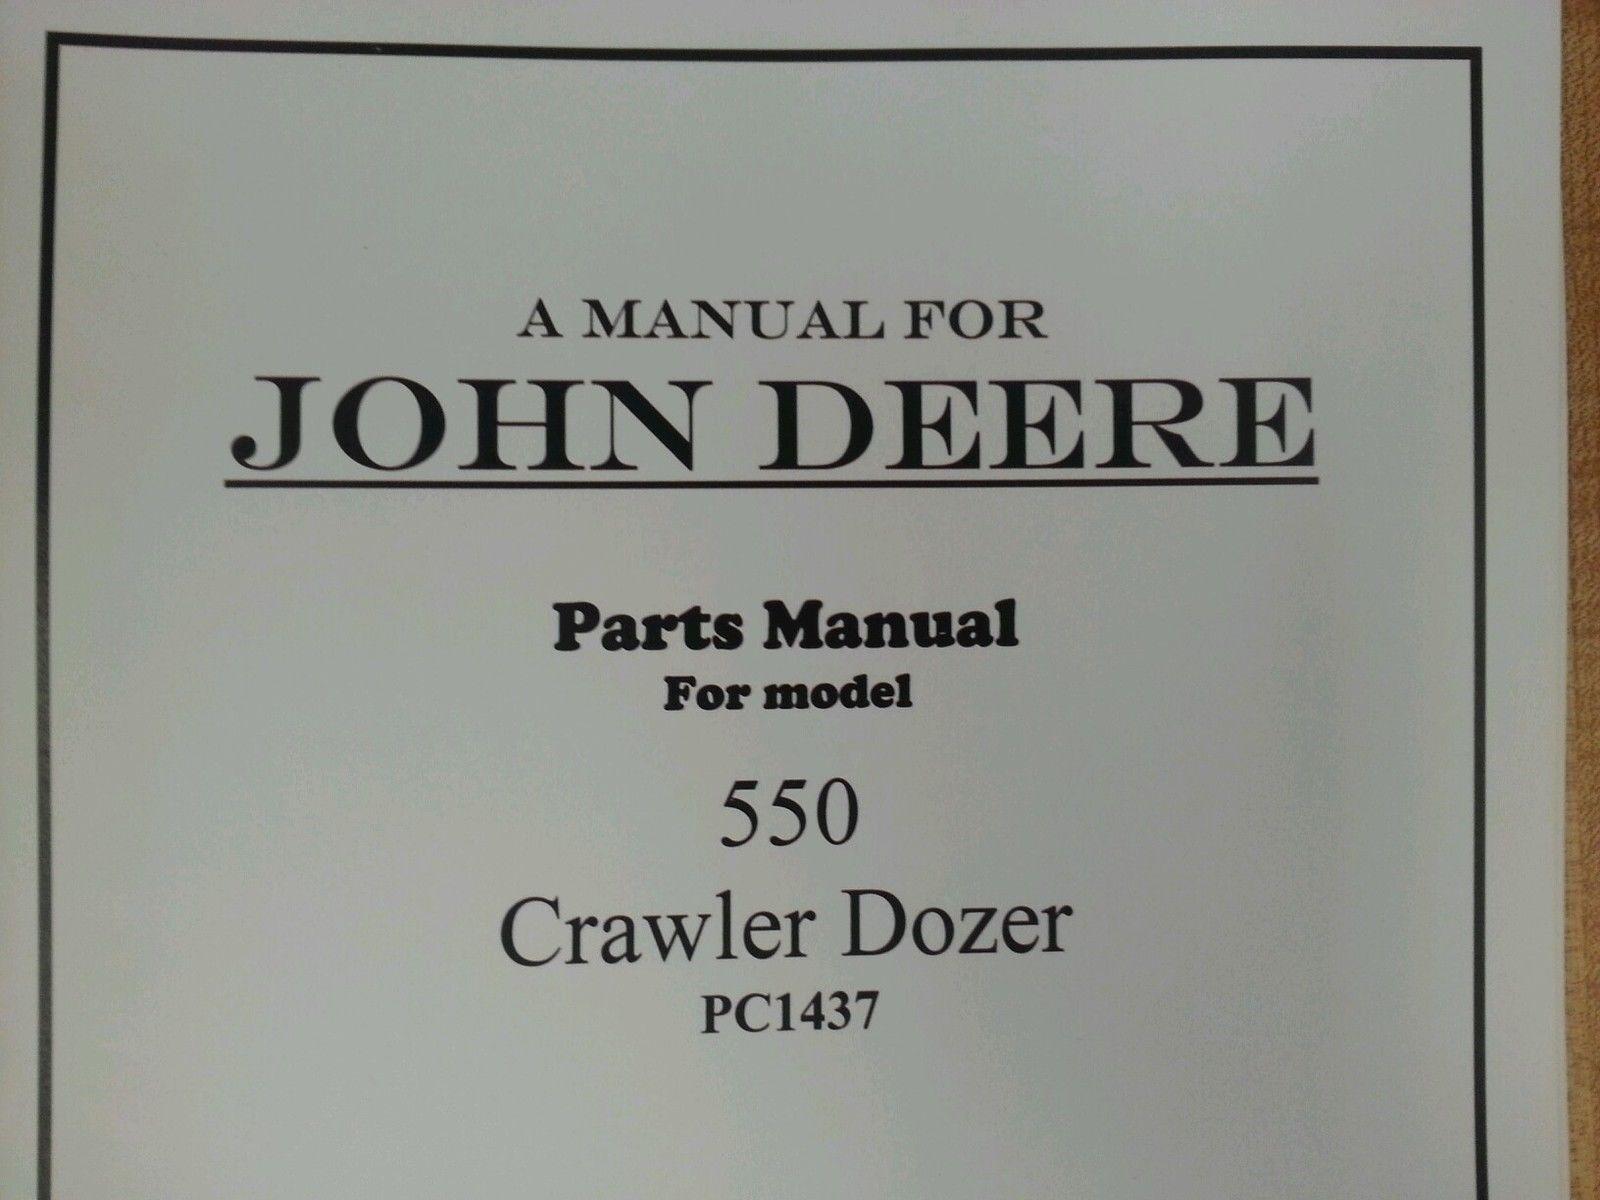 John Deere Jd 550 Crawler Dozer Parts Manual Pc1437